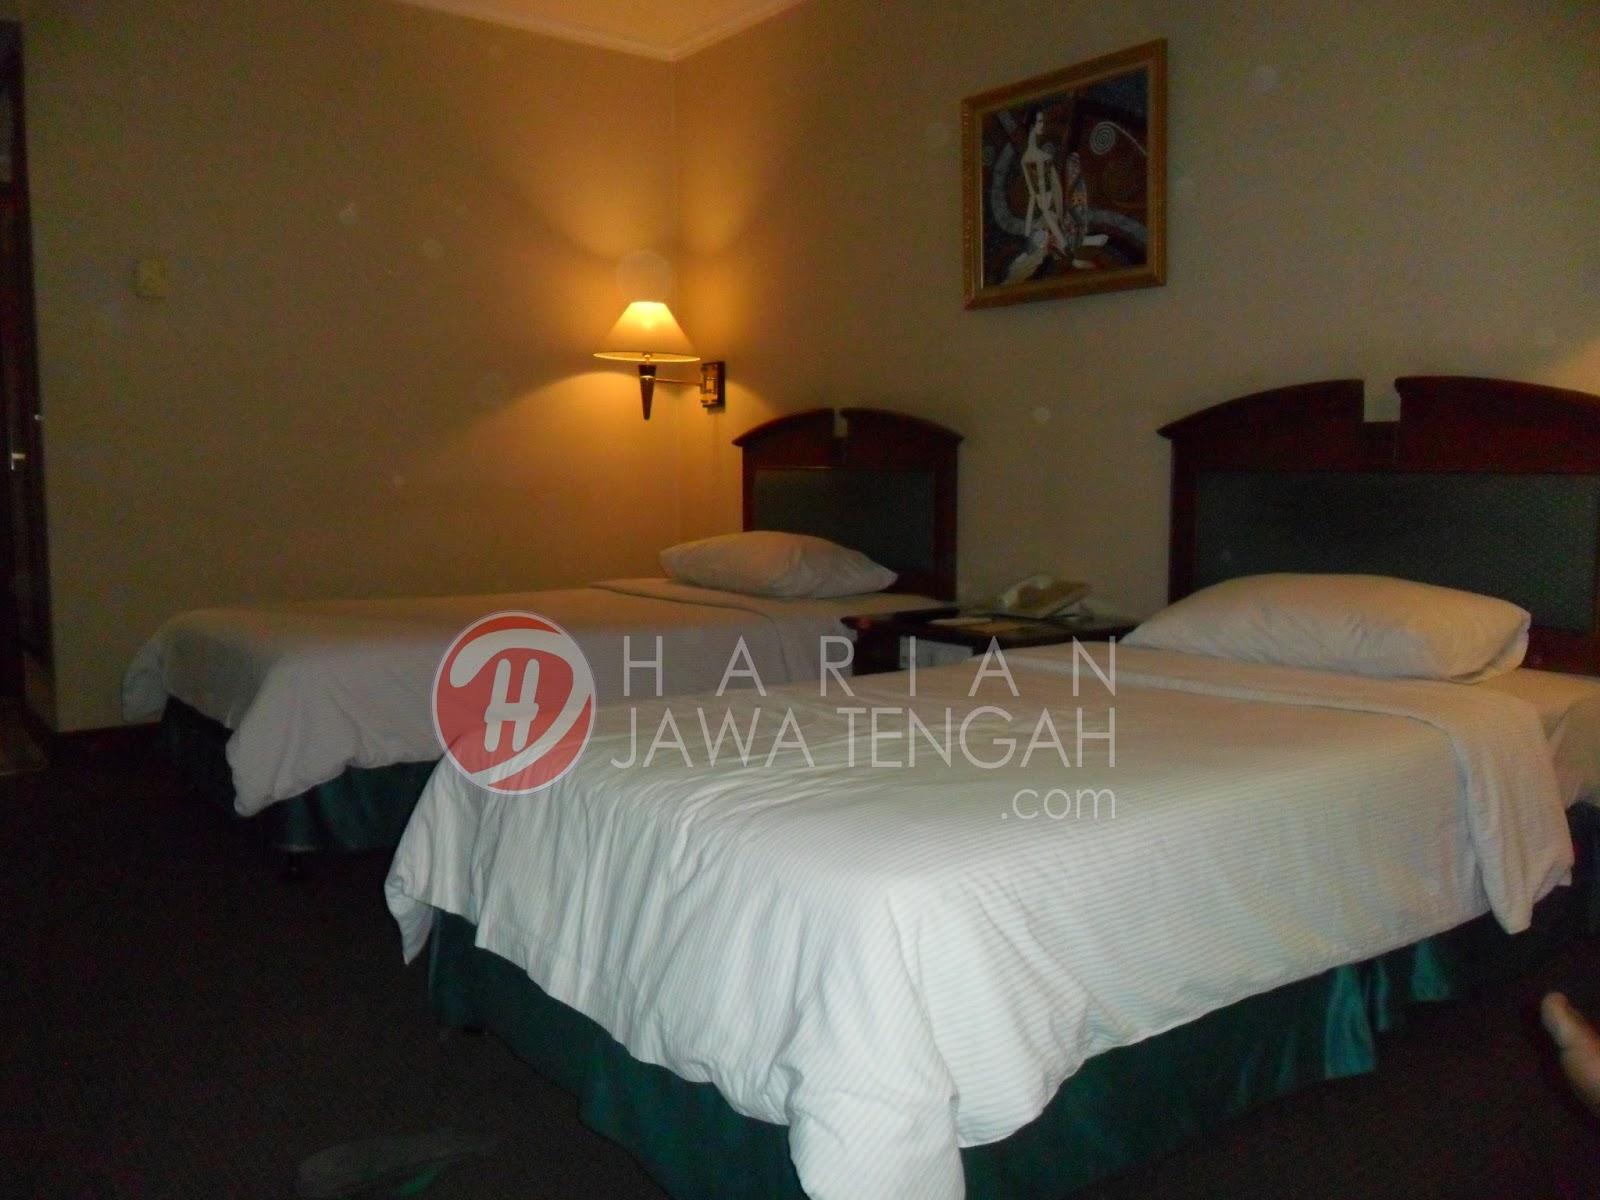 Mutiara Hotel Salatiga Central Java